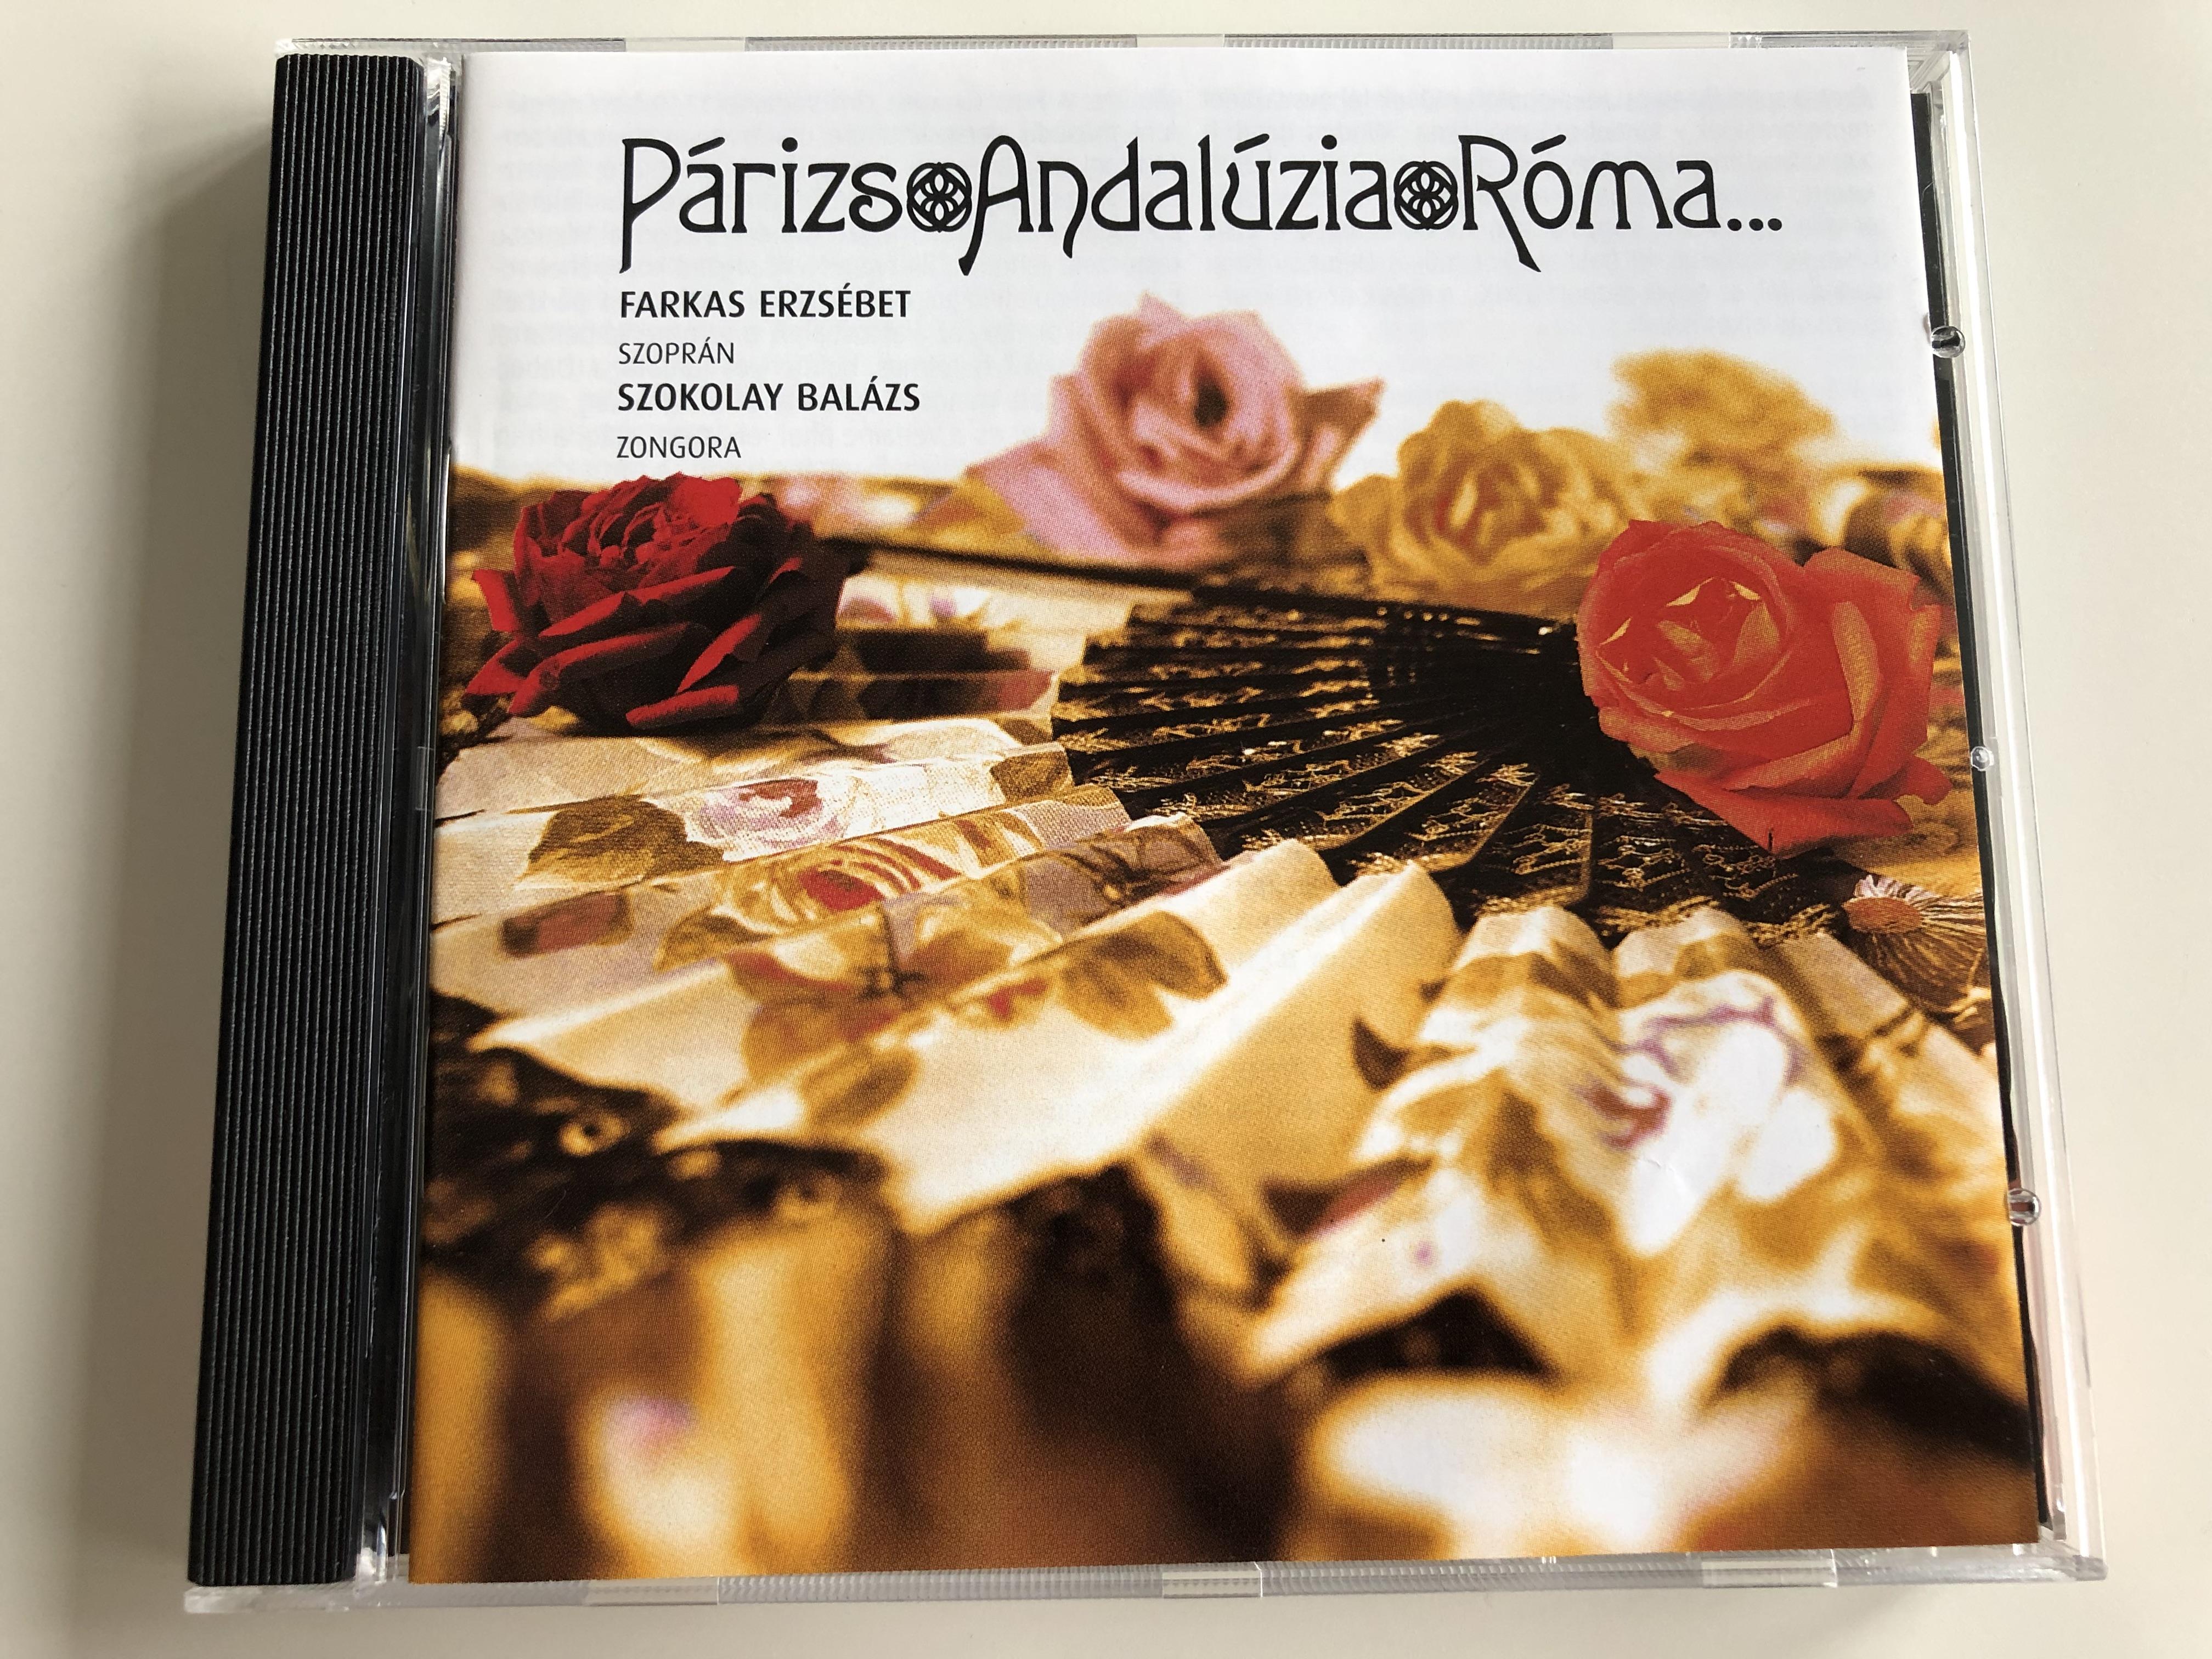 p-rizs-andal-zia-r-ma-farkas-erzs-bet-sopran-szokolay-bal-zs-piano-audio-cd-tomkin-031-1-.jpg